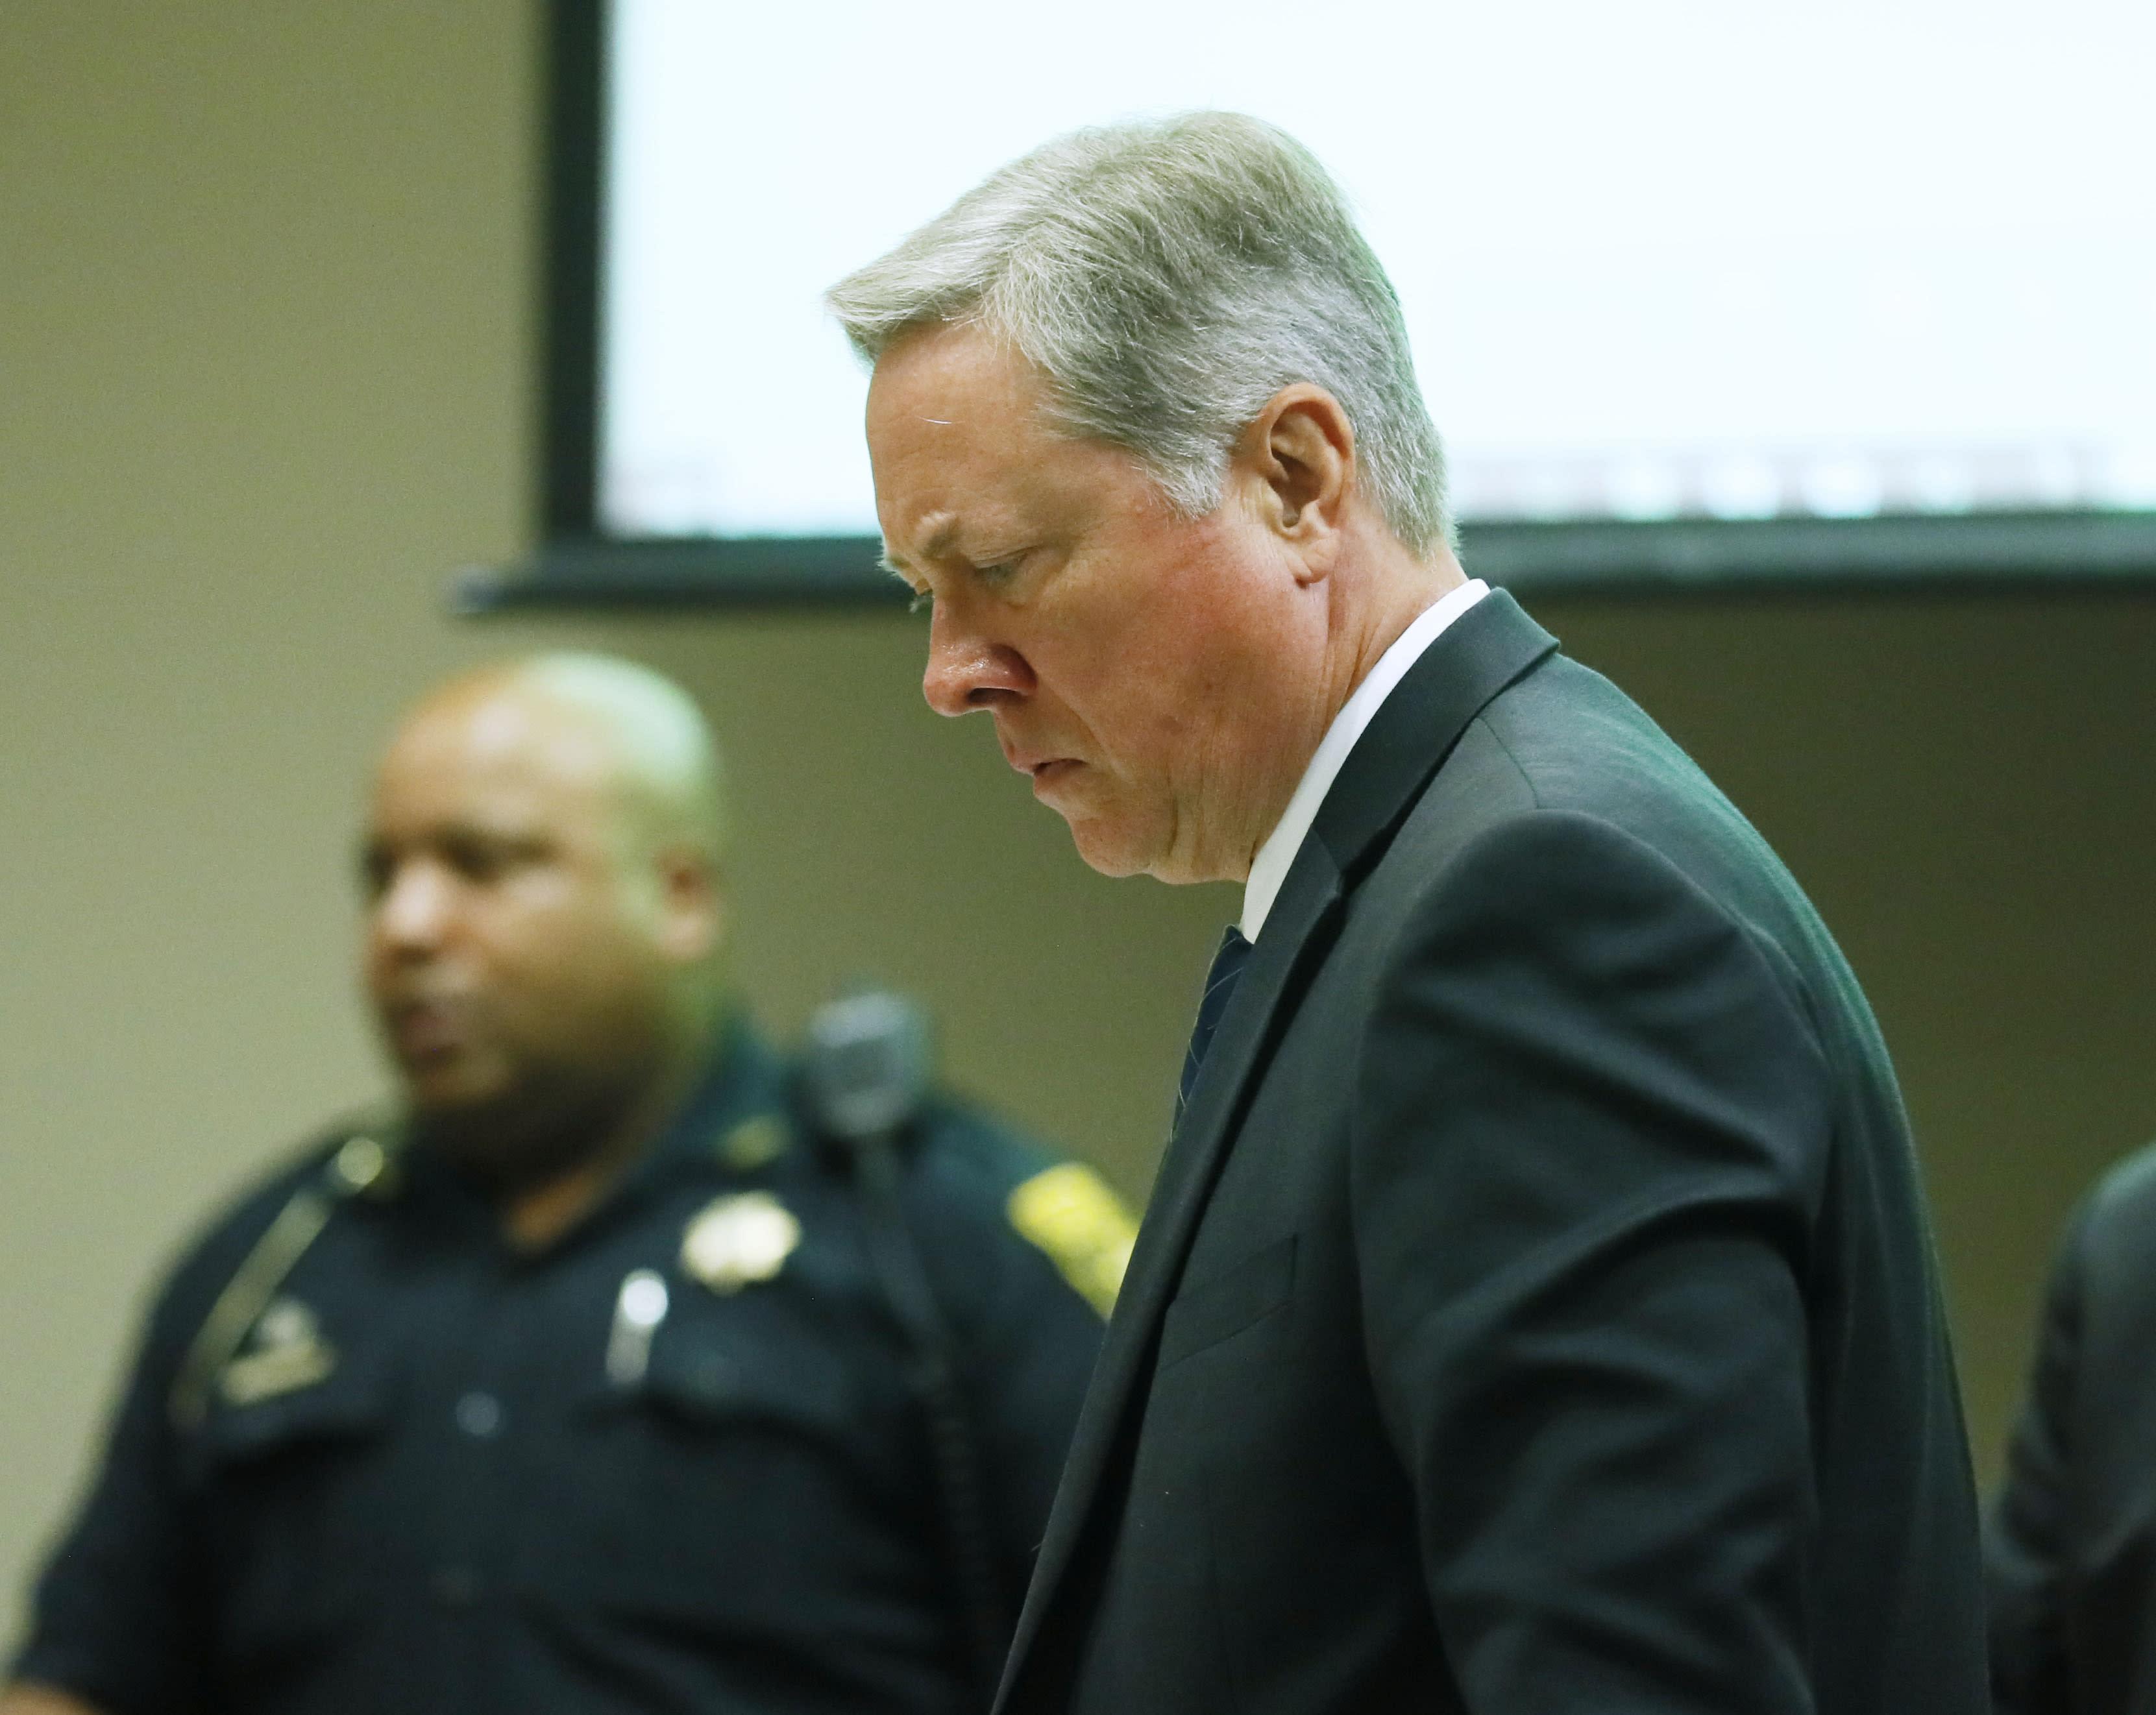 Georgia officer who fatally shot naked black man pleads